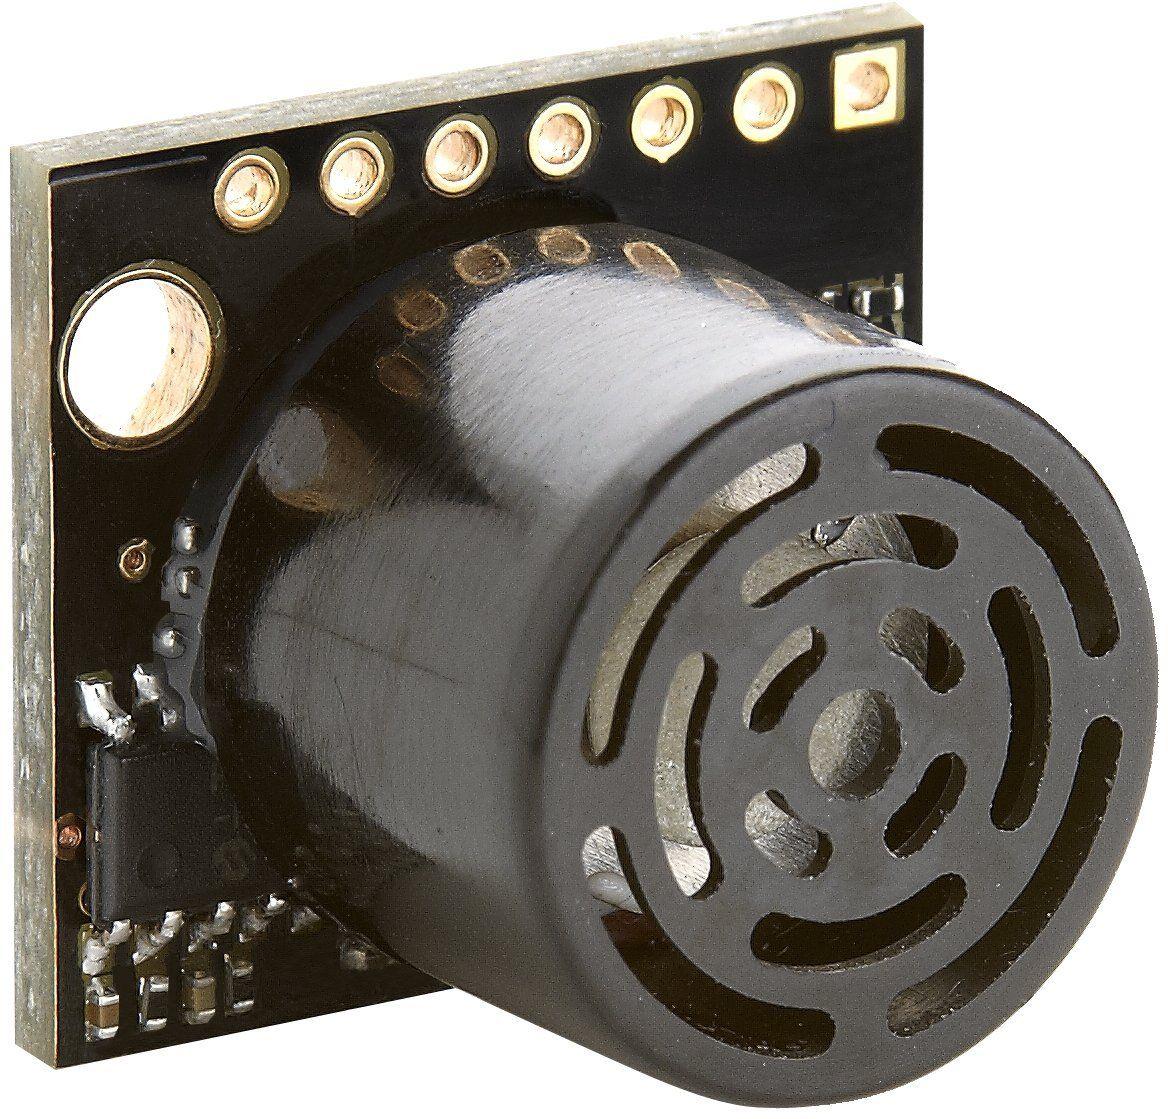 MB1003 HRLV-MaxSonar-EZ0 Ultrasonic Sensor